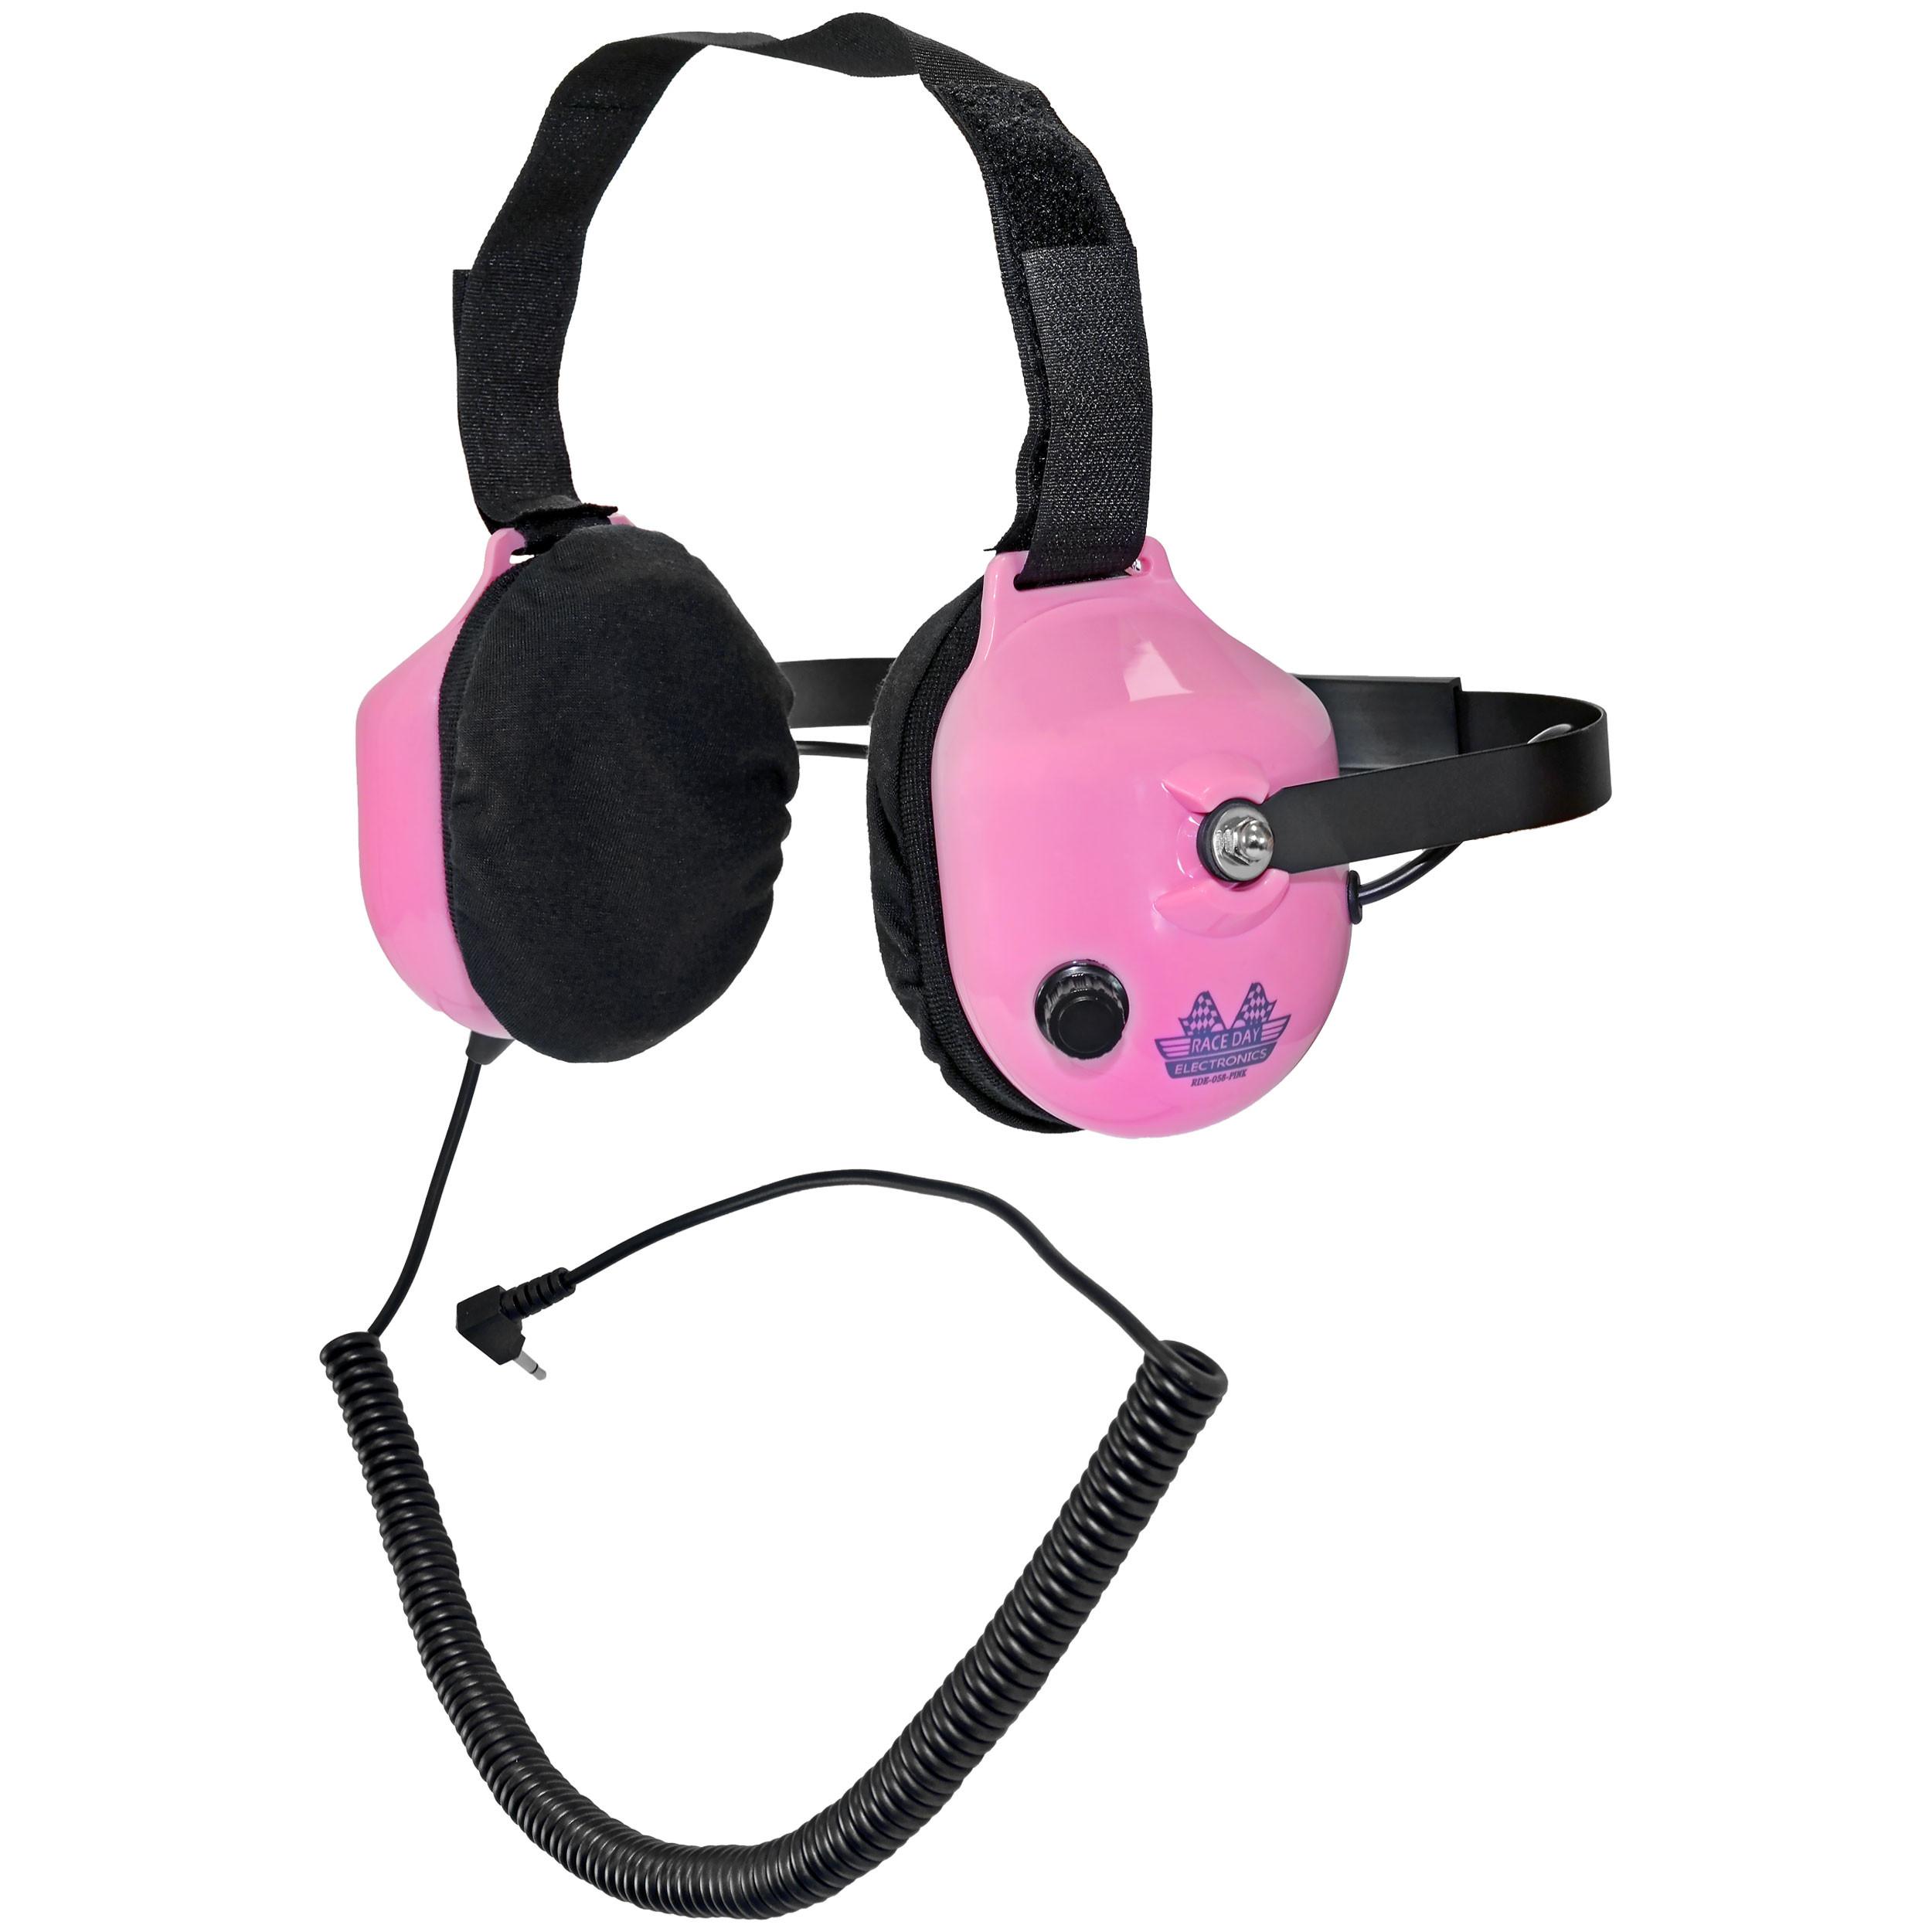 Noise-Reducing Race Scanner Headphones - Pink